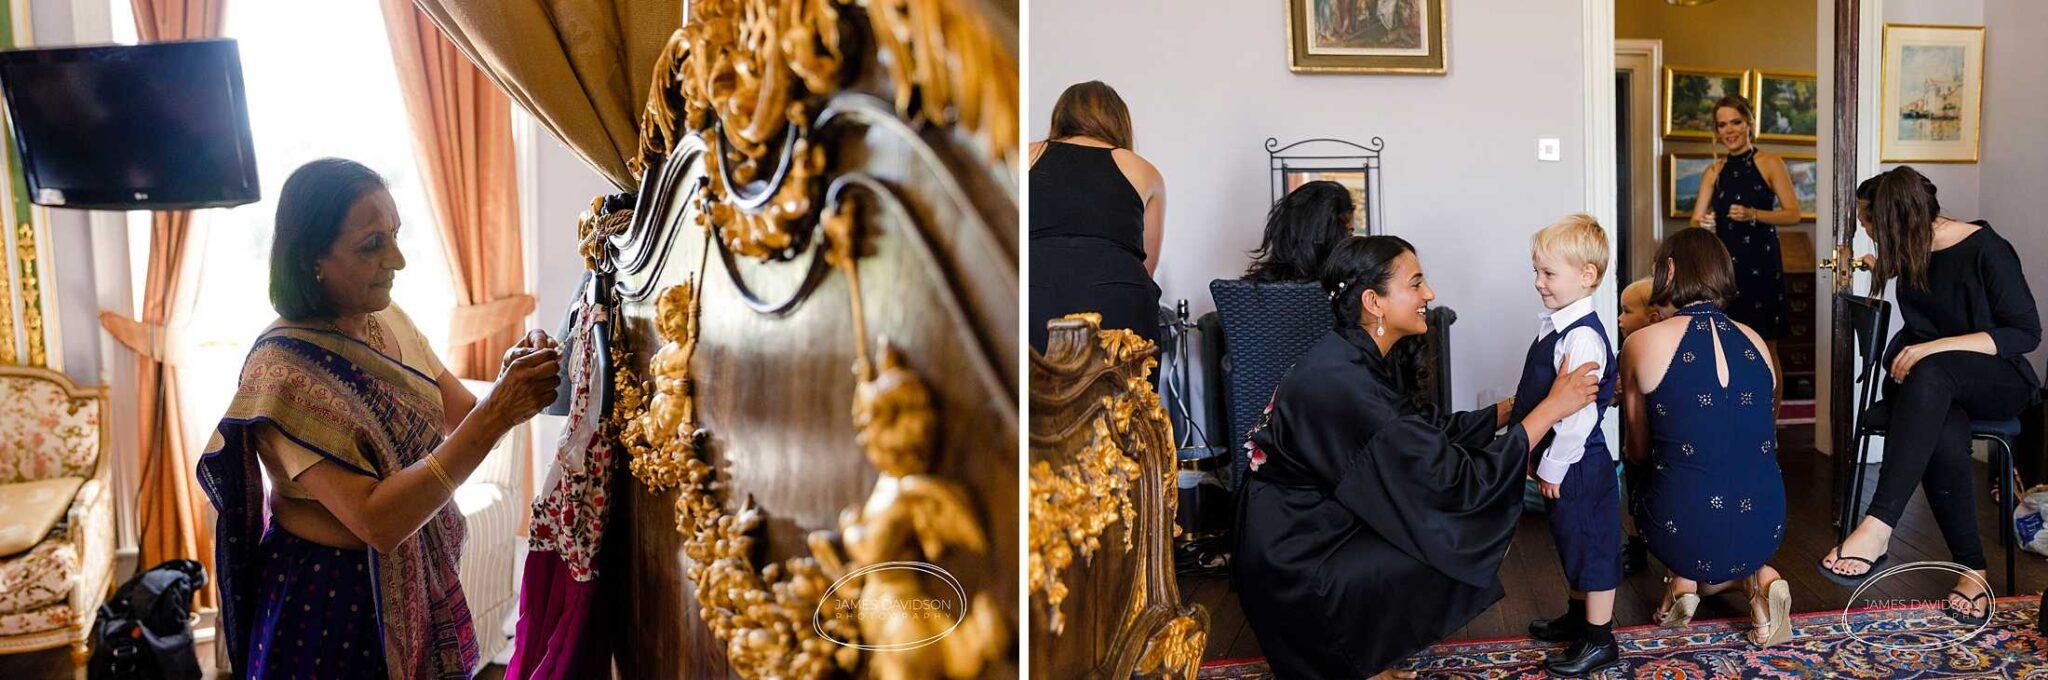 anstey-hall-wedding-014